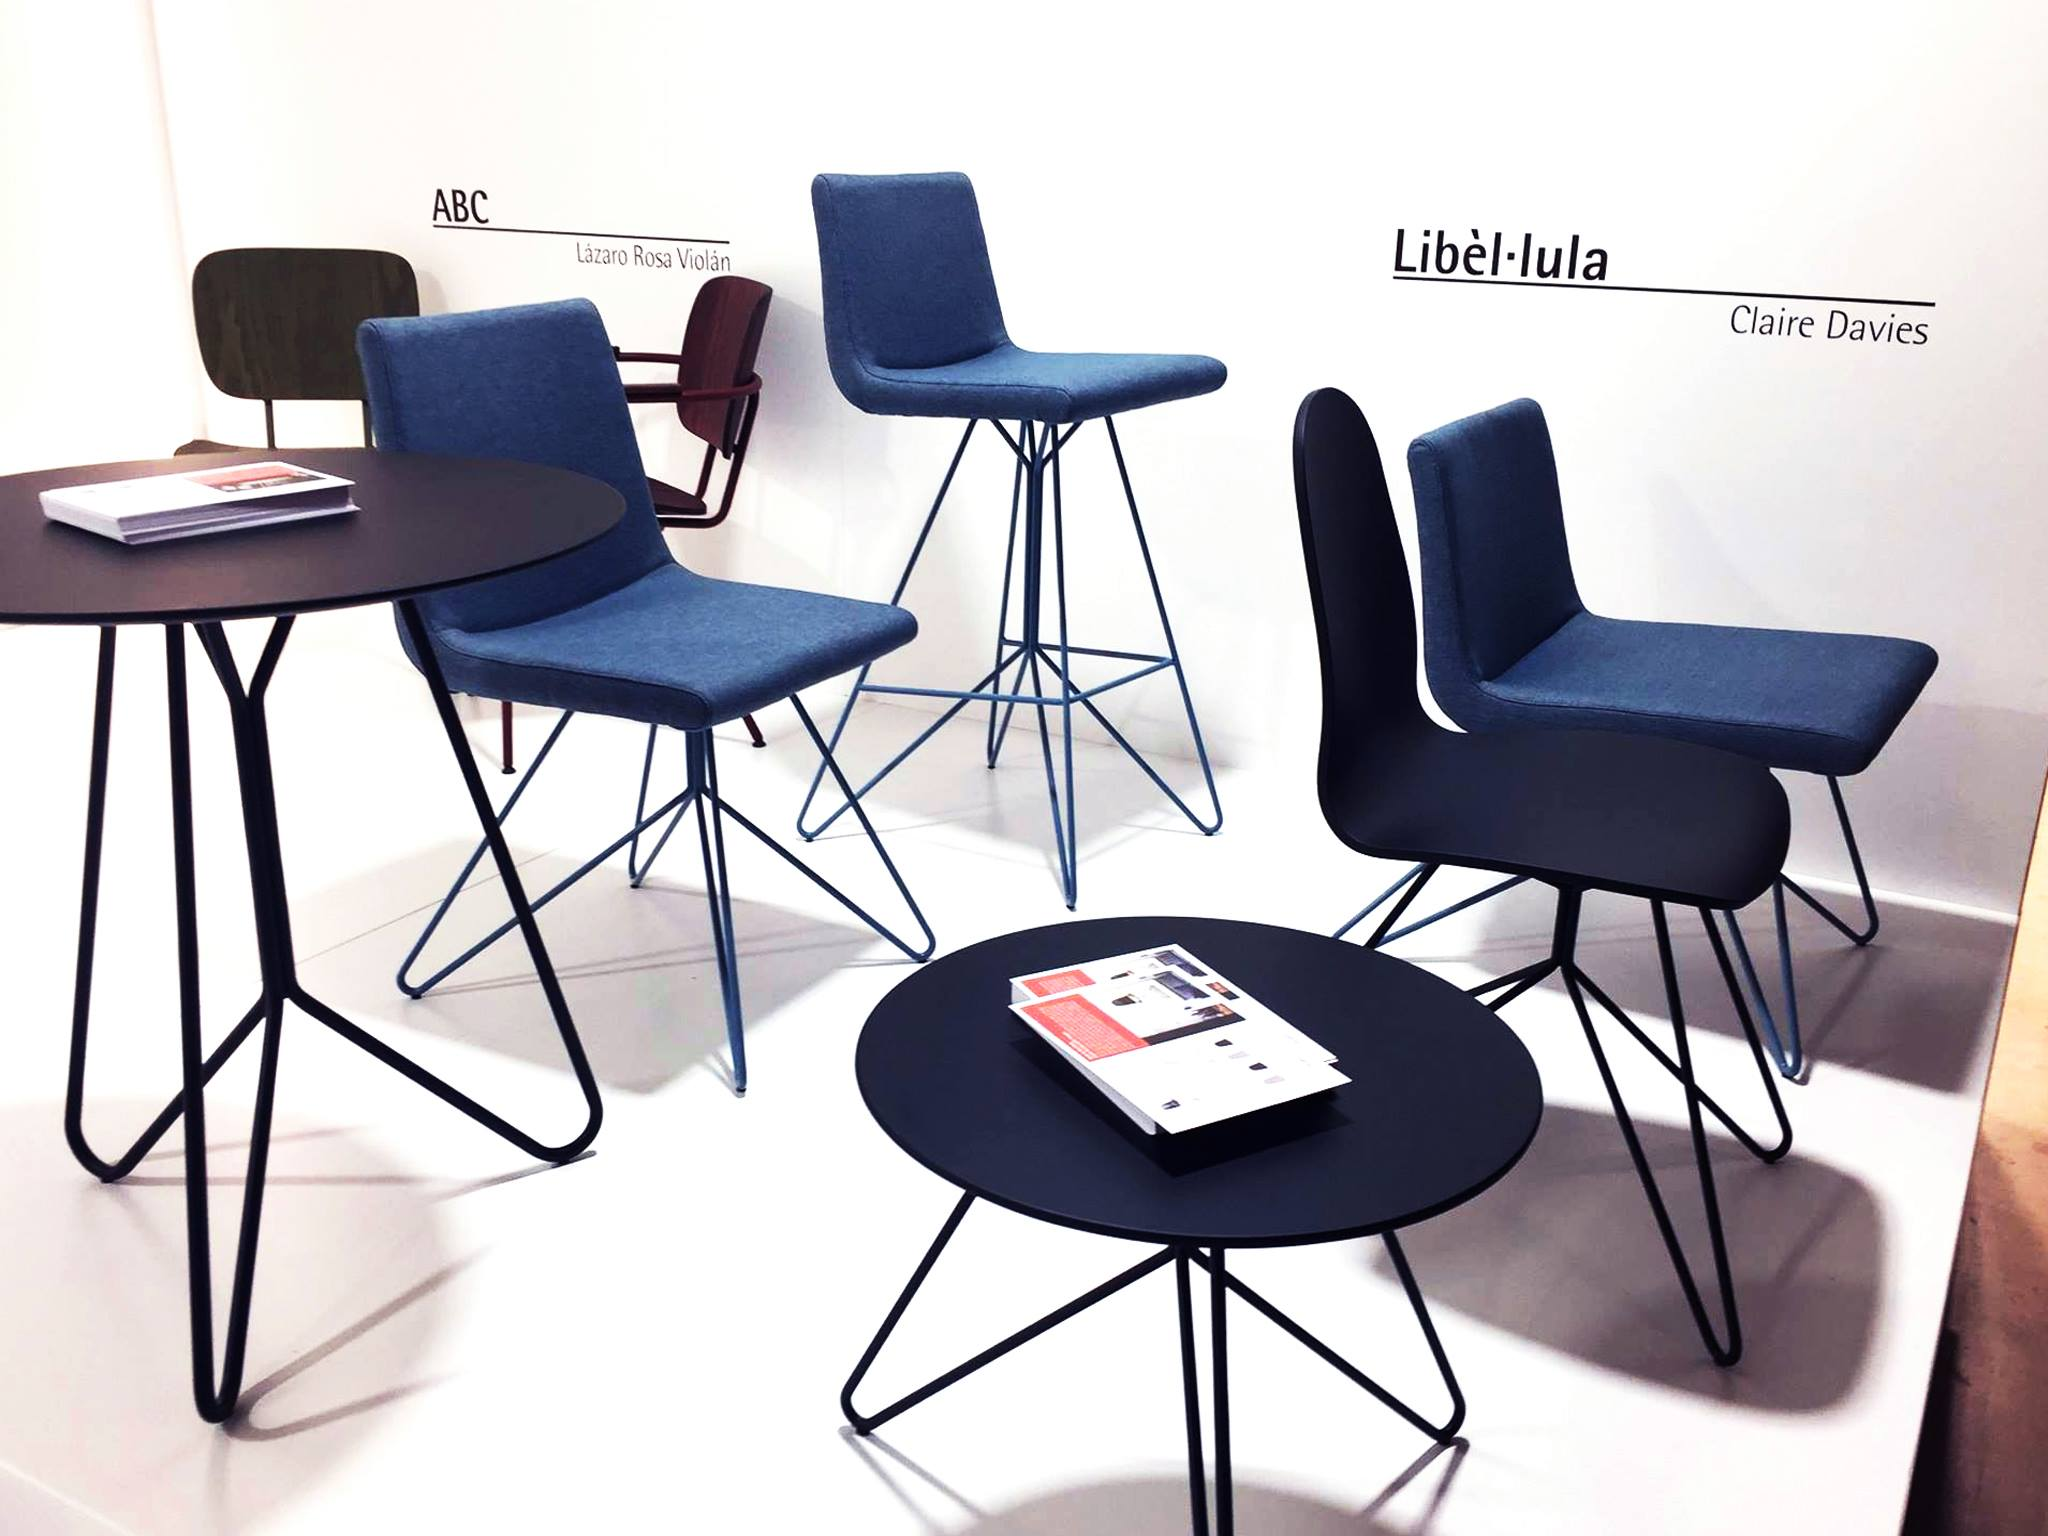 libelula tables, dragon fly chair, claire davies